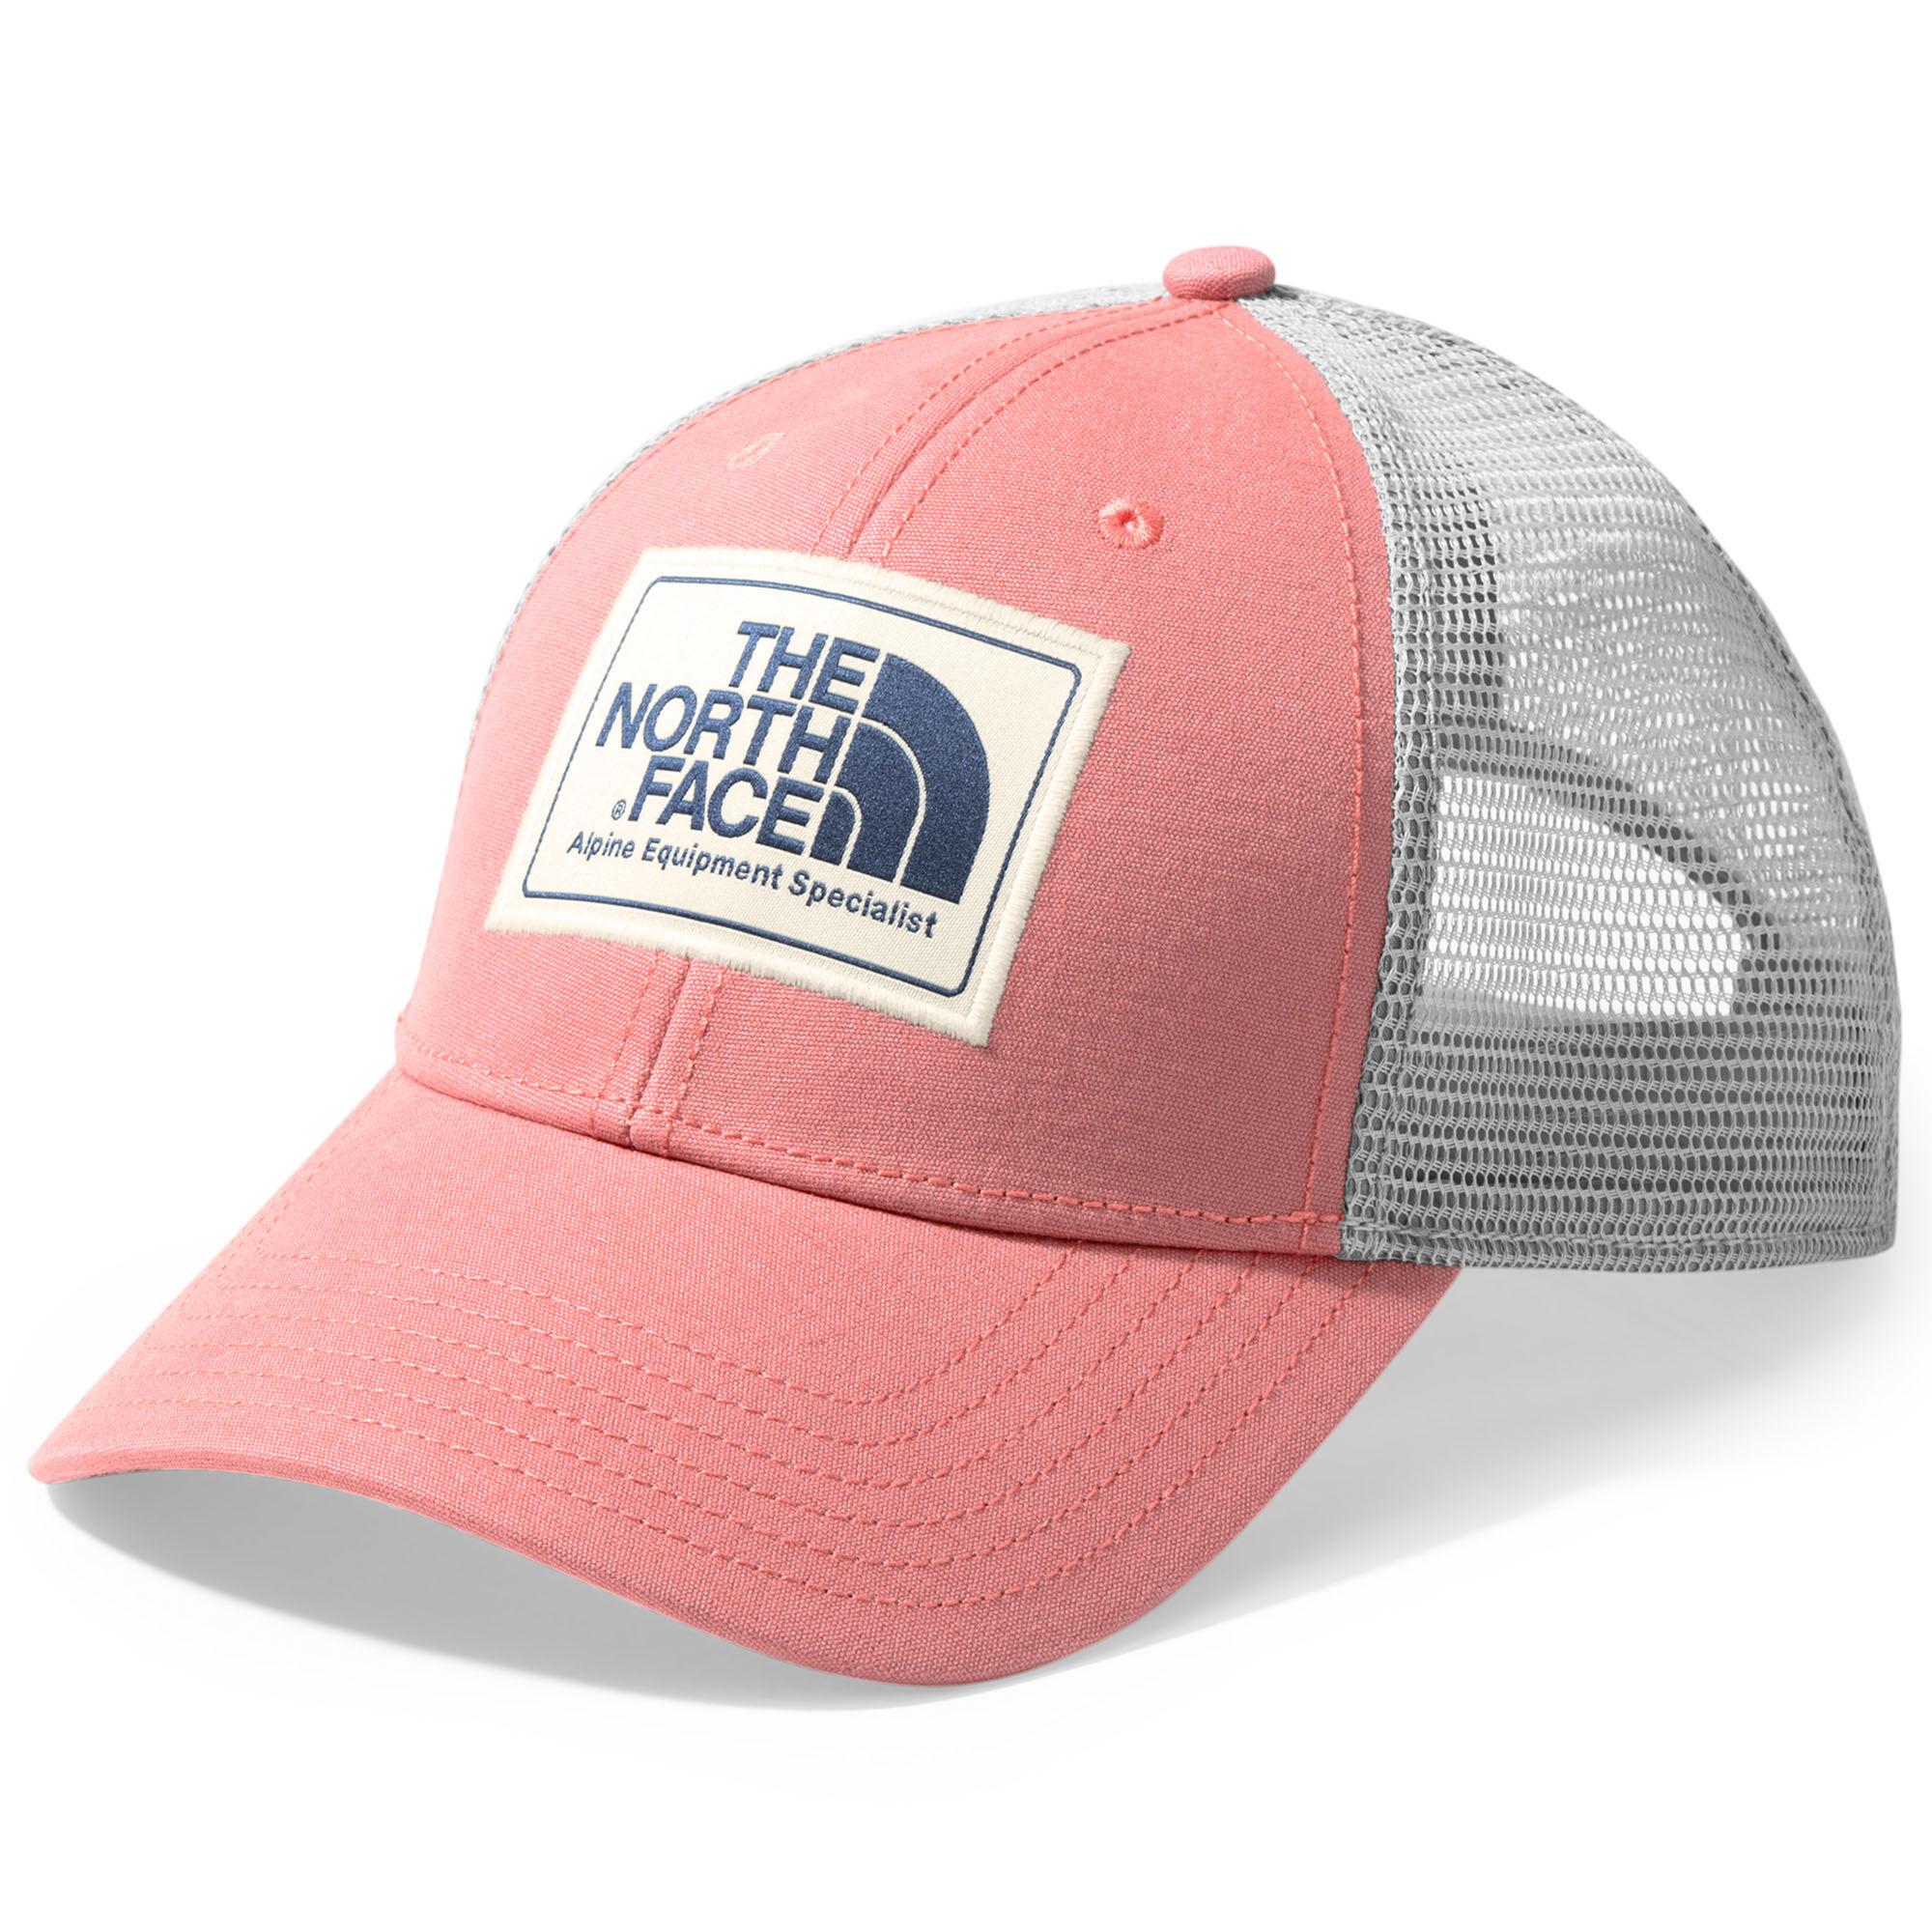 The North Face Men's Mudder Trucker Hat  - TNF Medium Grey Heather - Size: One Size